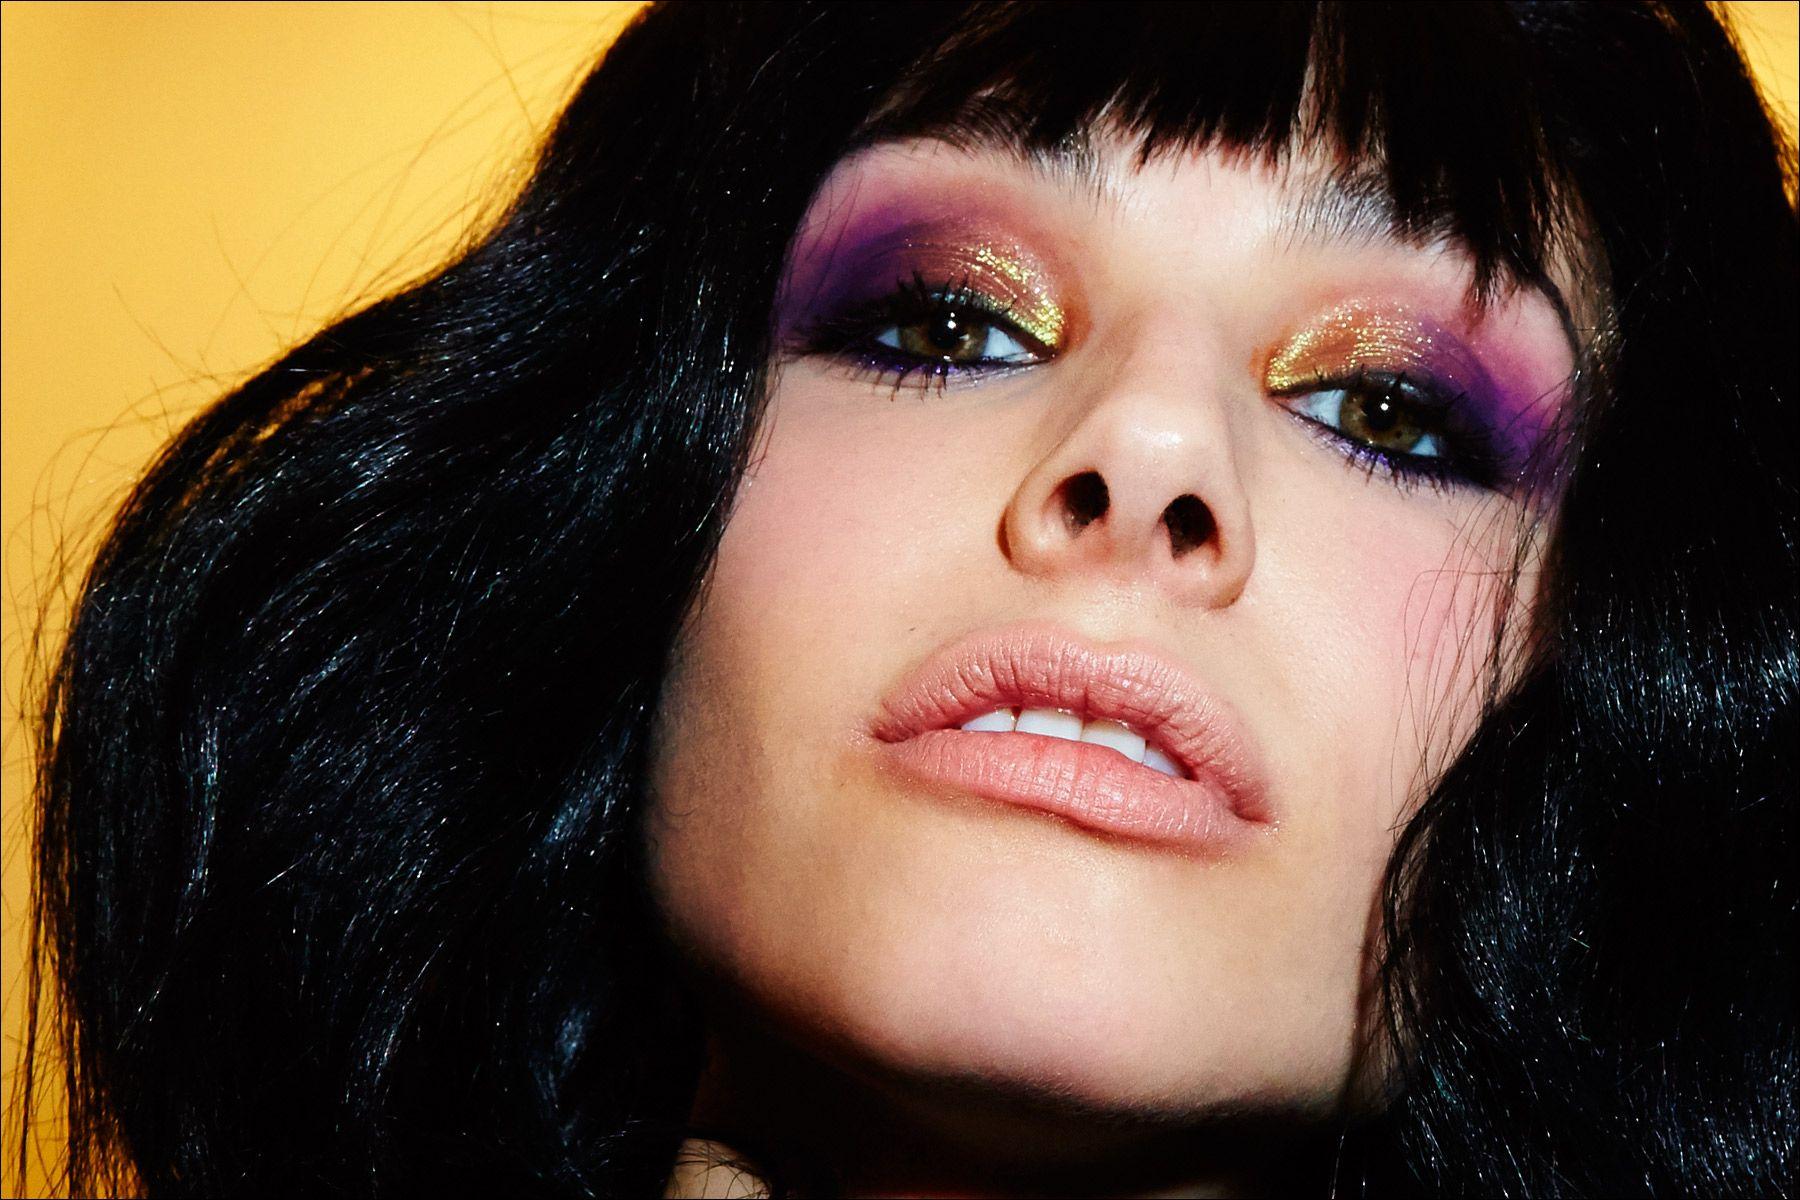 Model Alla Goncharova wearing MAC makeup, keyed by Romero Jennings, backstage at the Georgine Fall/Winter 2017 show. Photography by Alexander Thompson for Ponyboy magazine.